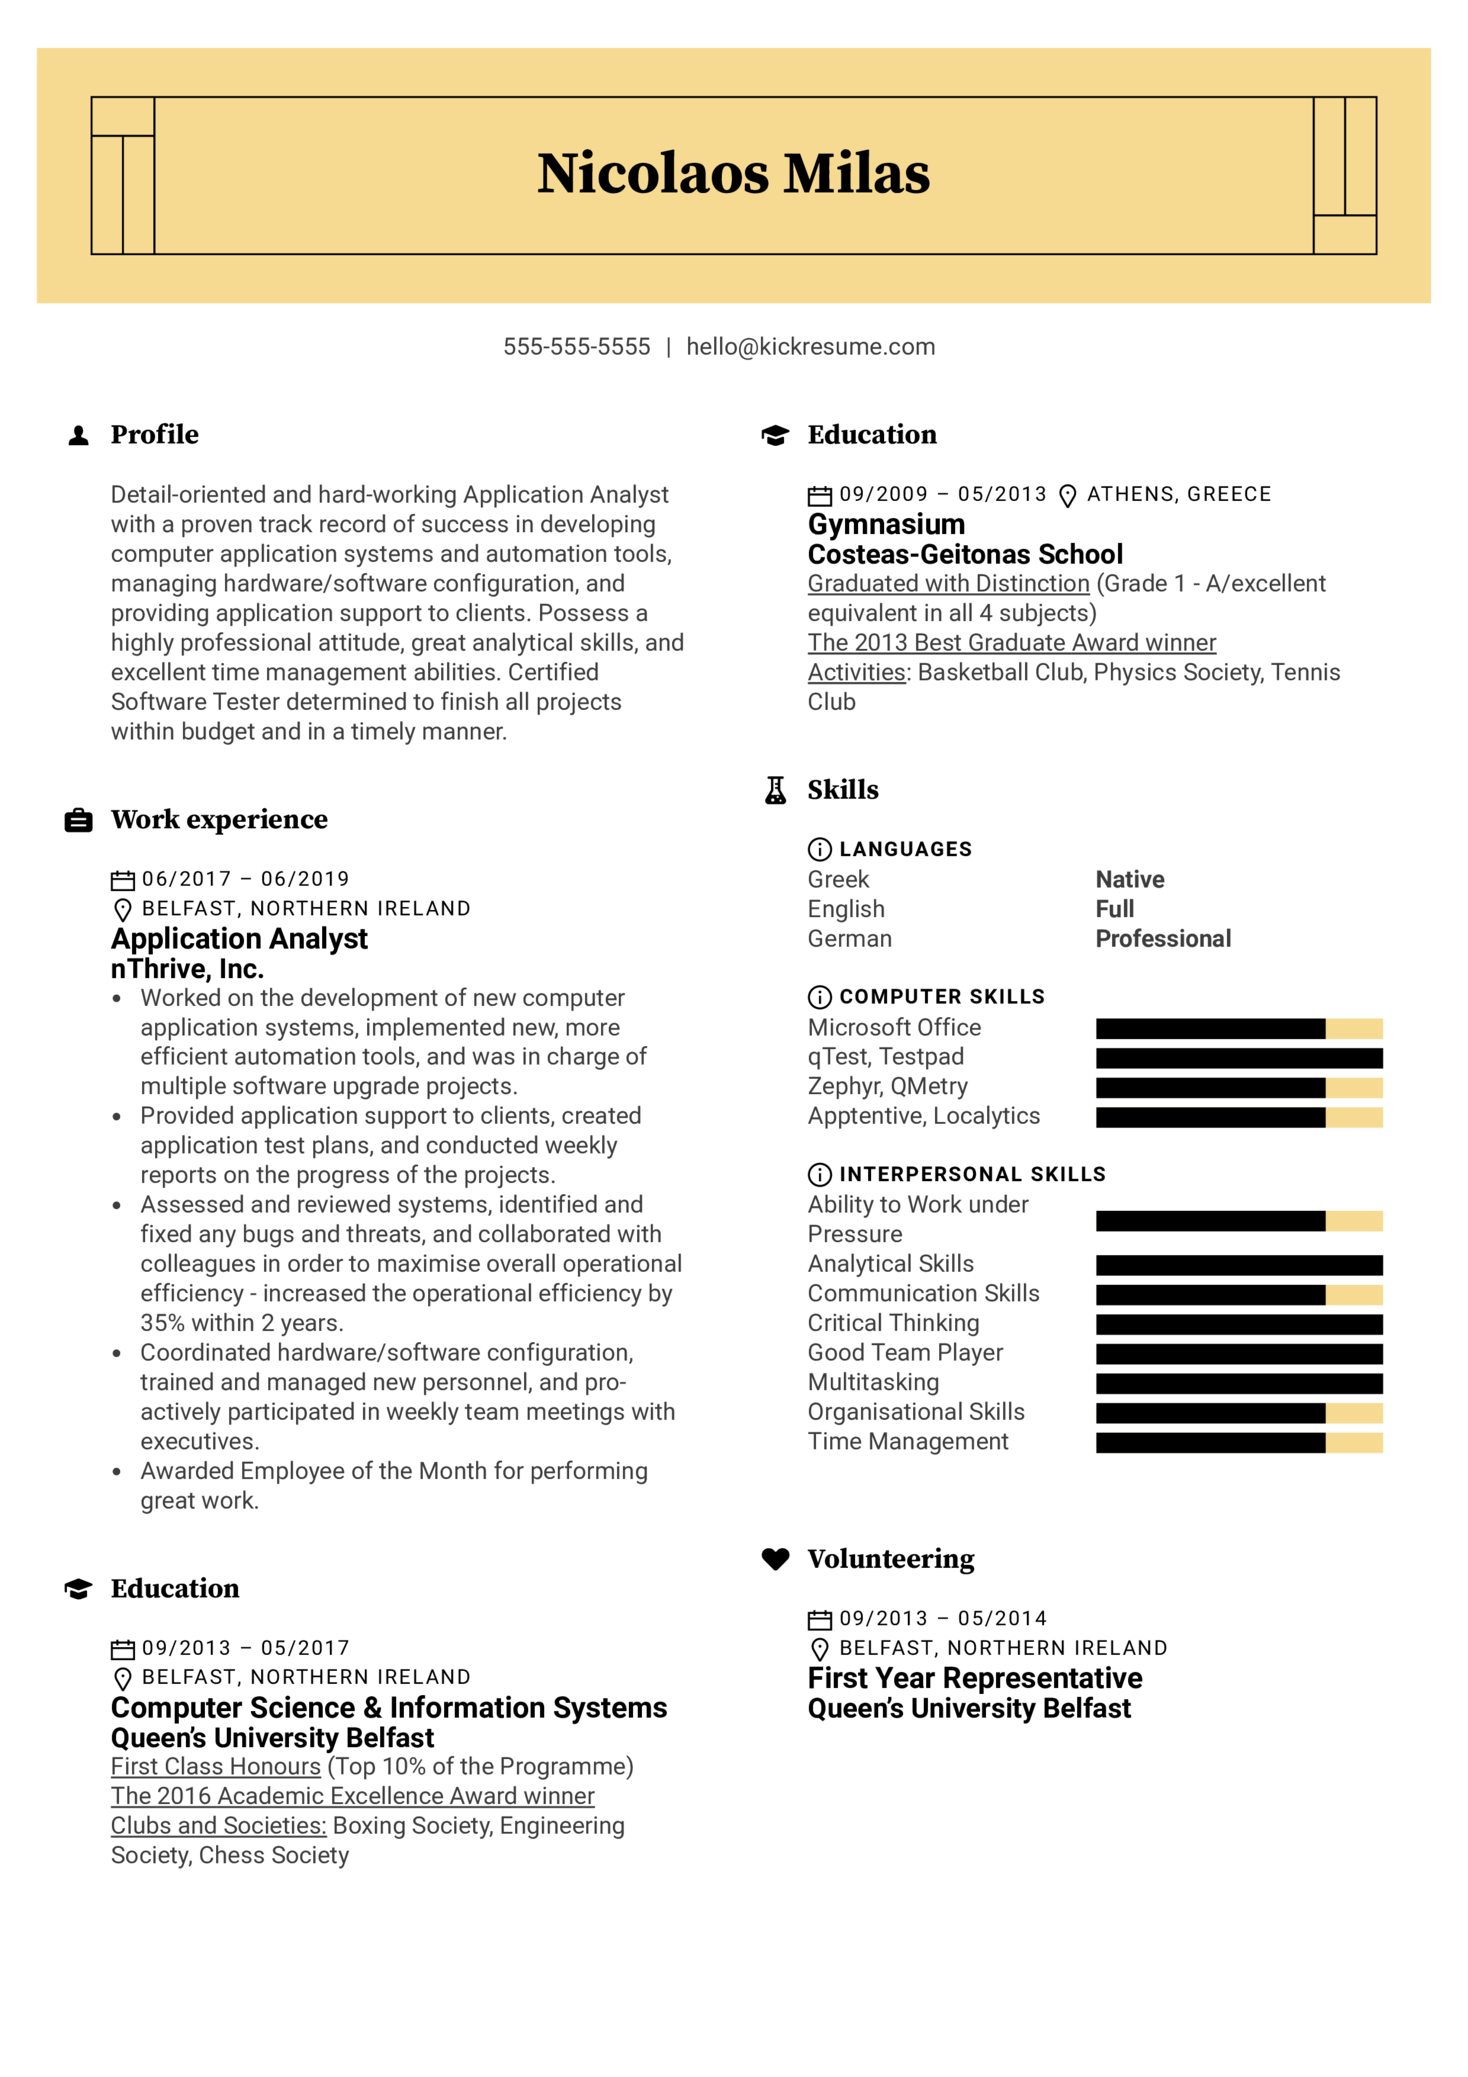 Application Analyst Resume Sample (parte 1)